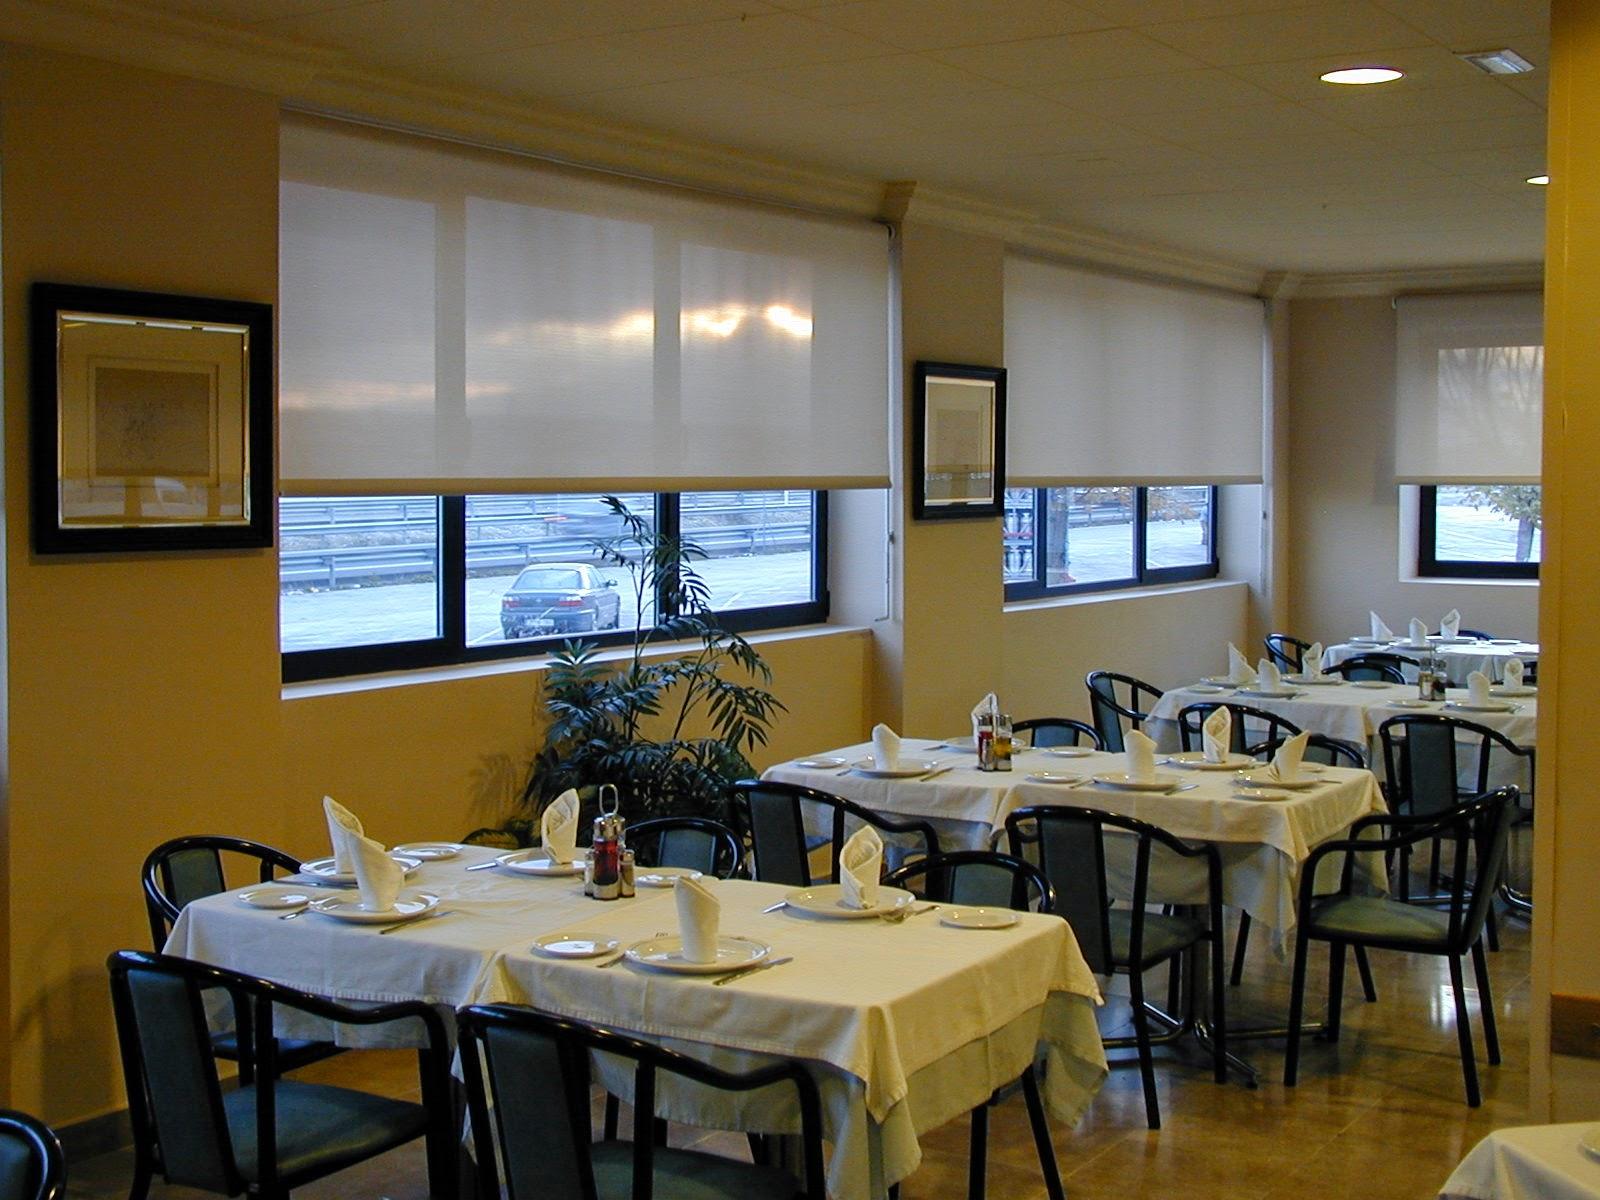 Hotel Restaurante Paraiso